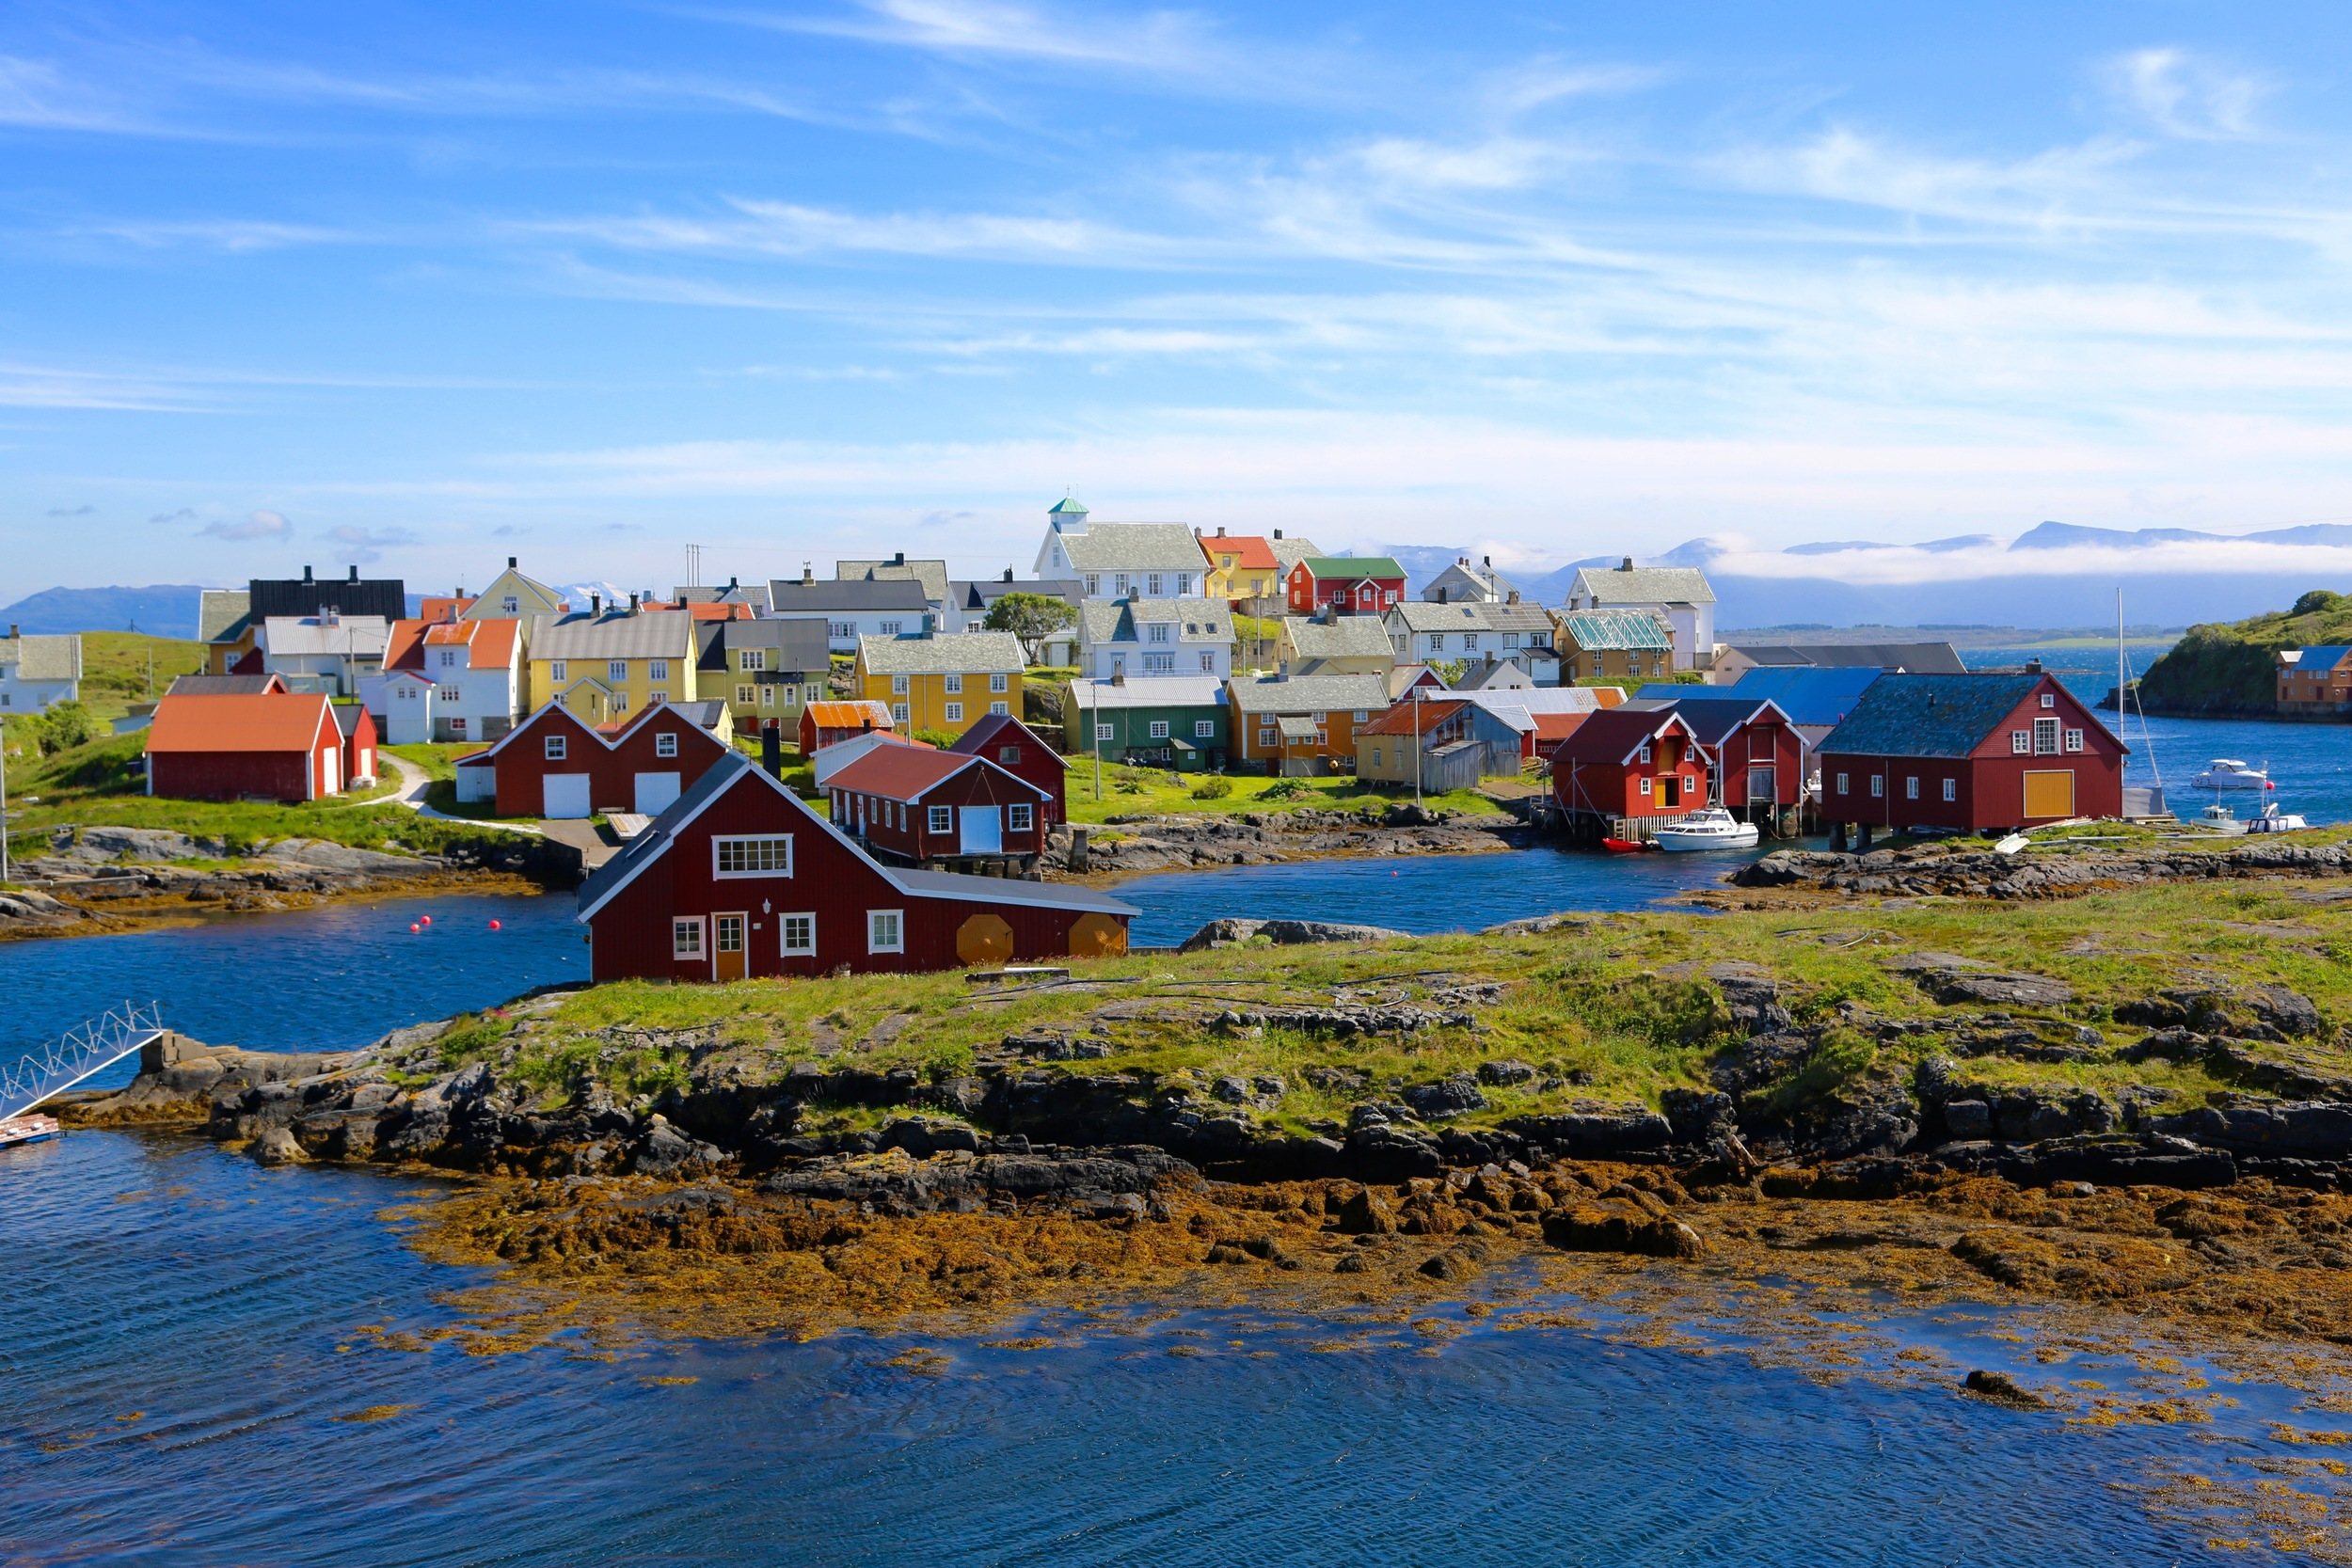 Dette er Nordre Bjørnsund - sett fra Moøya hvor det automatiserte fyret står. Foto: Odd Roar Lange